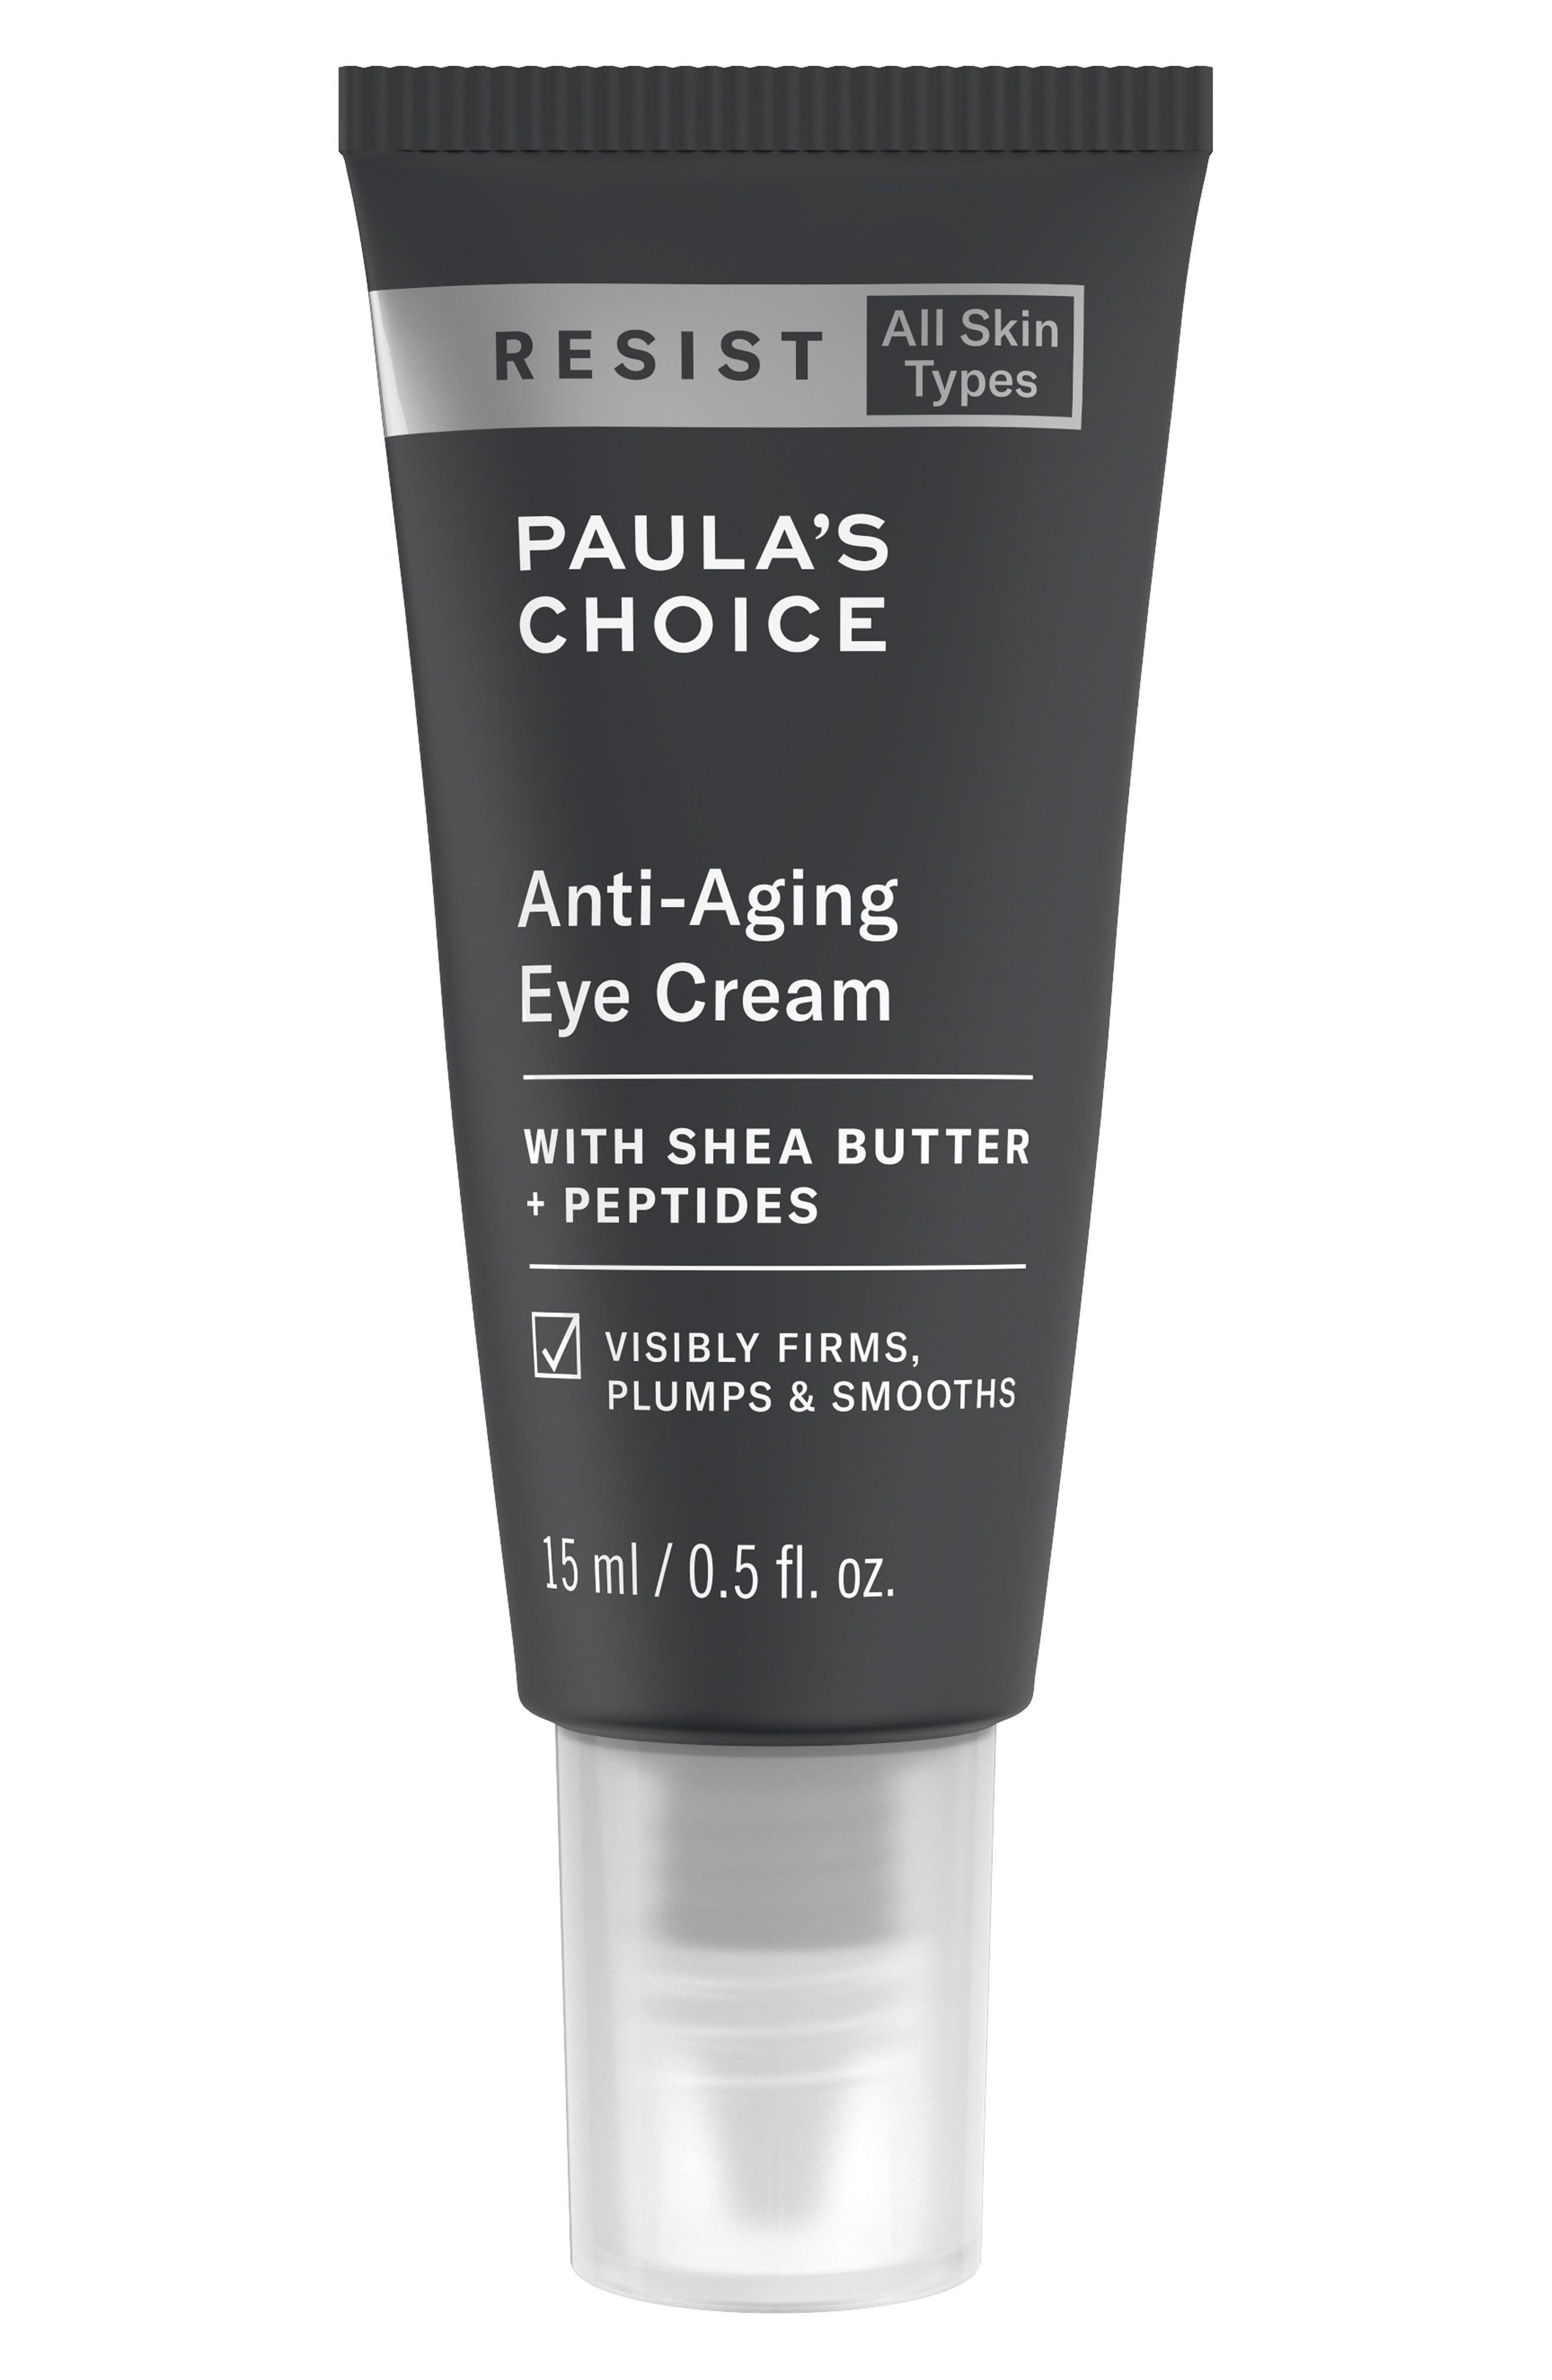 Facialmoisturizerforoilyskin In 2020 Eye Anti Aging Anti Aging Eye Cream Eye Cream